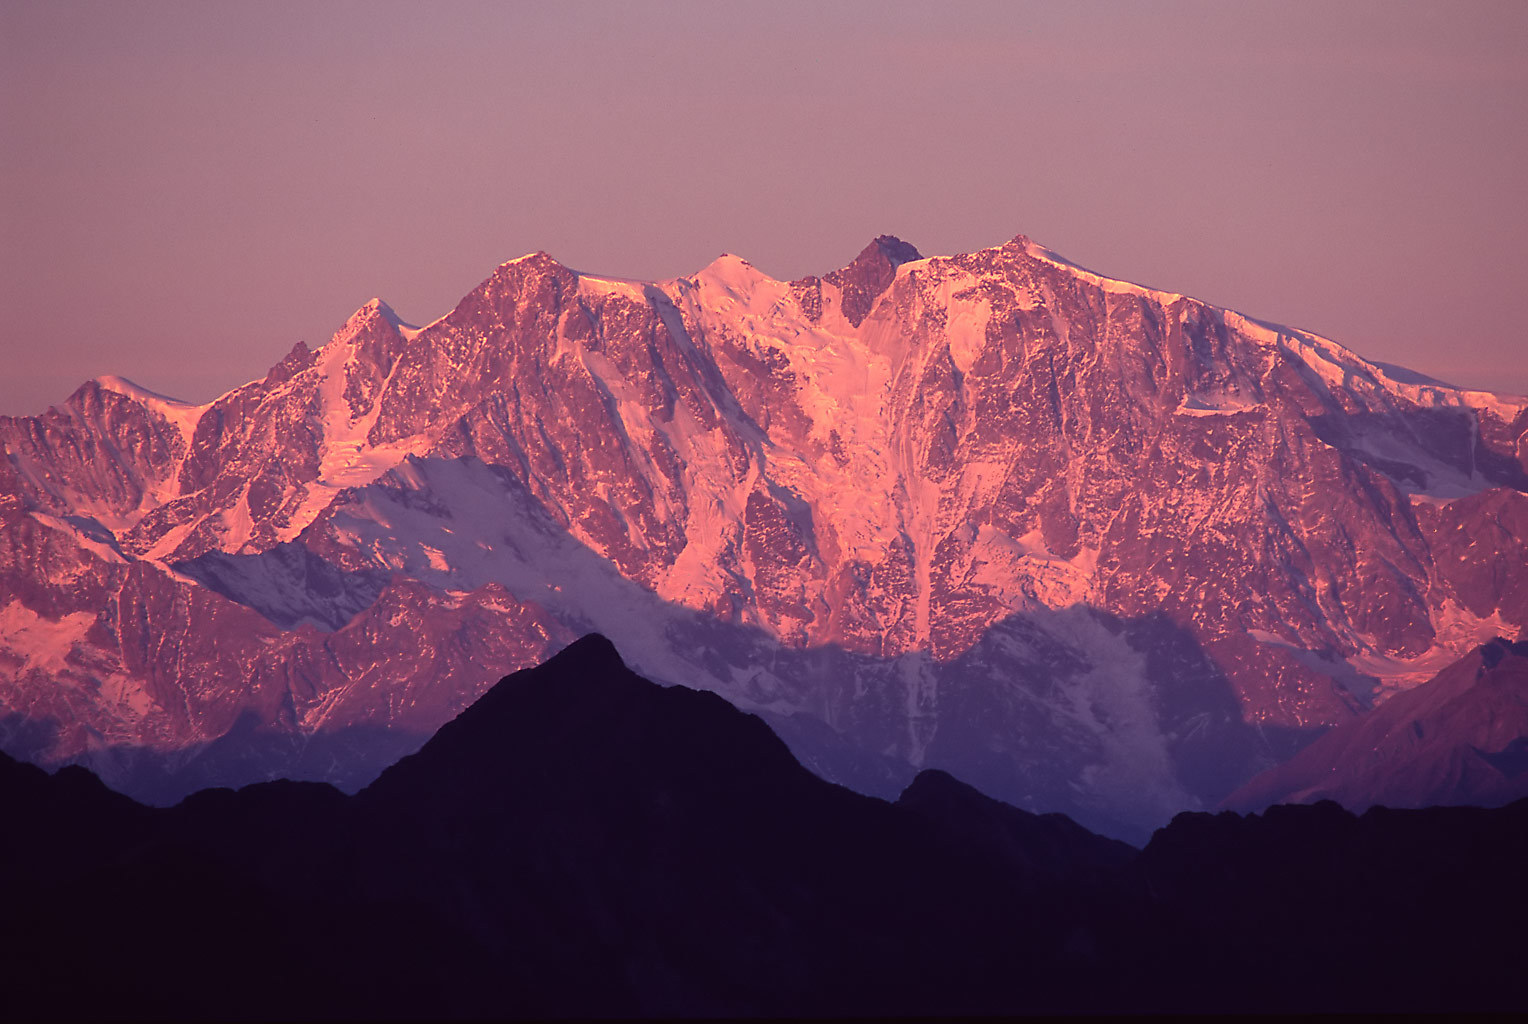 Elveţia - Monte Rosa - 4634 metri